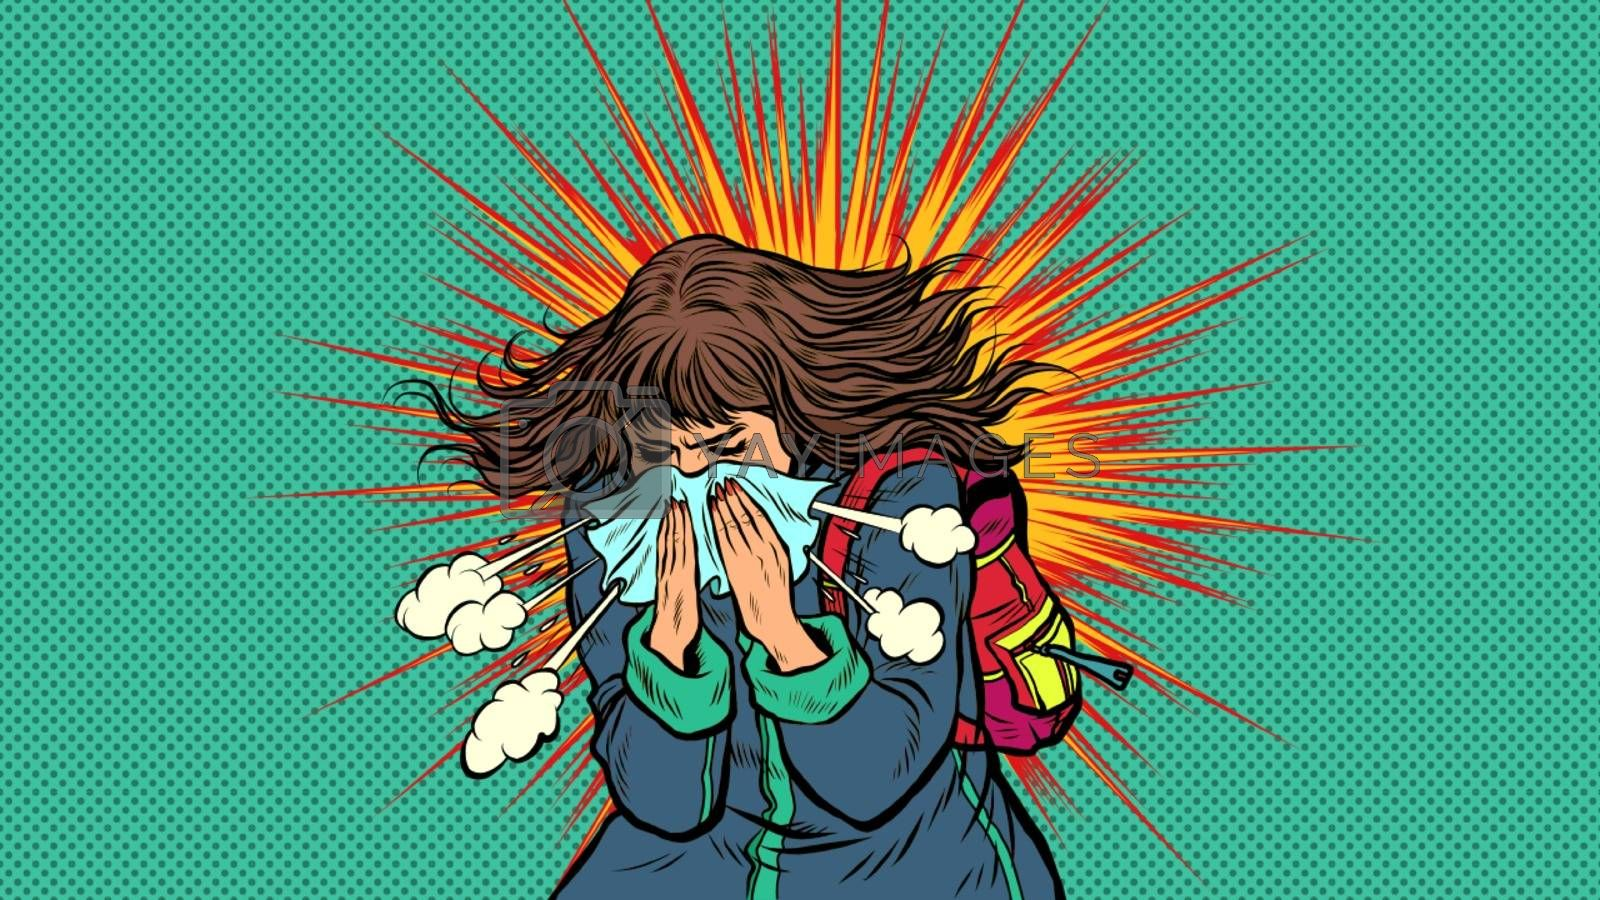 Woman sneezes, symptoms of the disease. Novel Wuhan coronavirus 2019-nCoV epidemic outbreak. Pop art retro vector illustration 50s 60s style